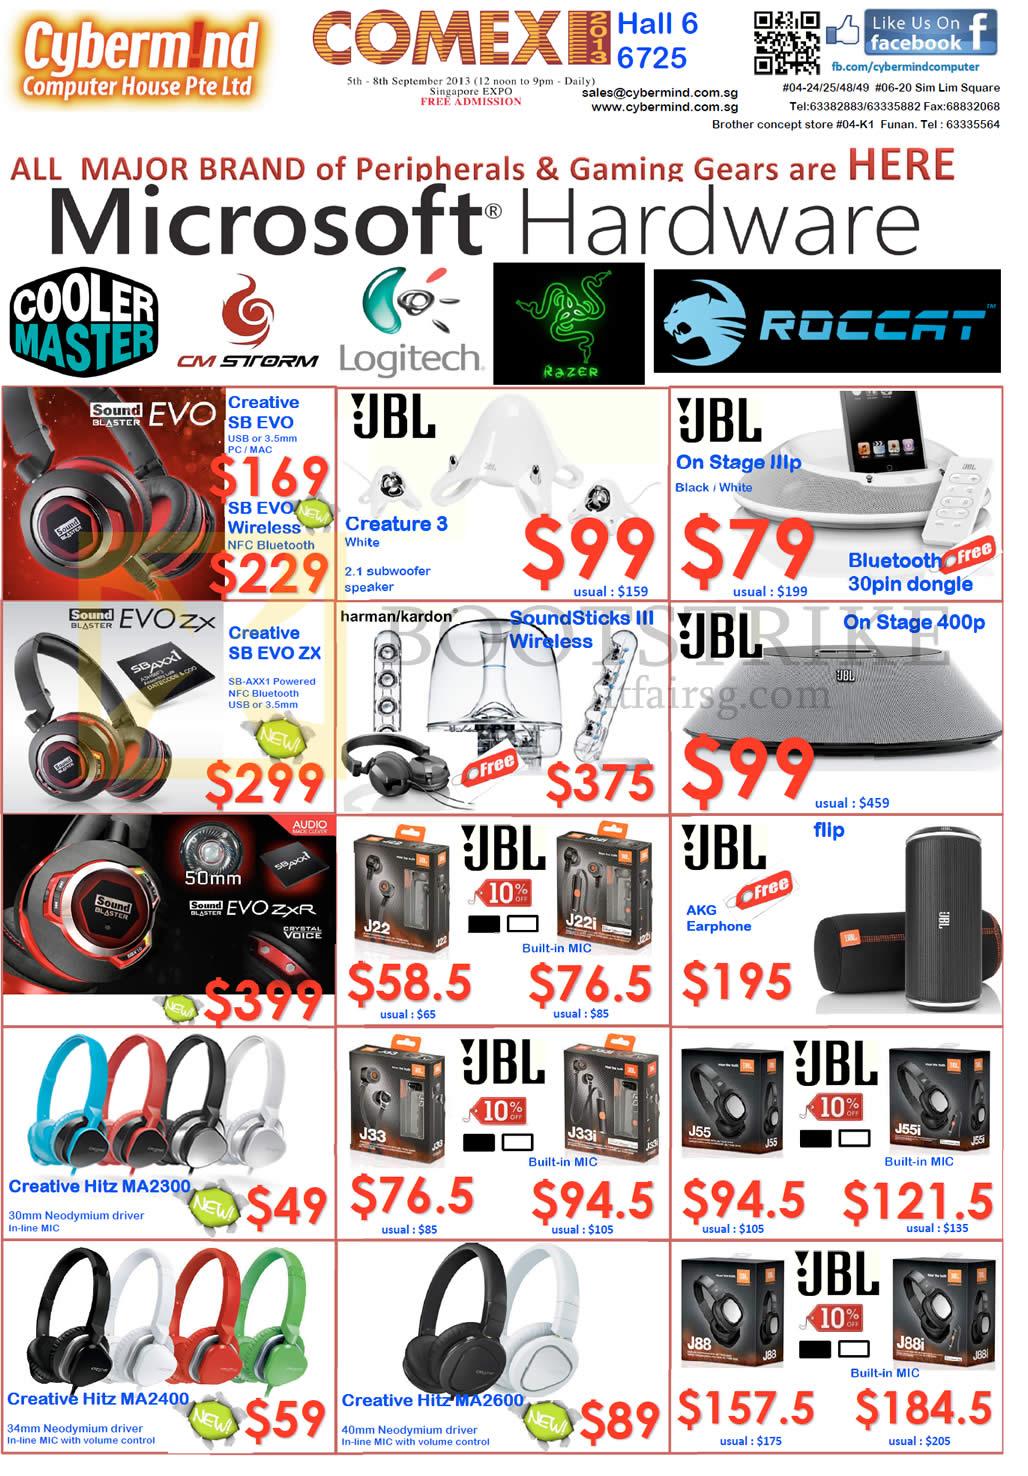 COMEX 2013 price list image brochure of Cybermind Headphones Creative Sound Blaster Evo Wireless, ZX, ZXR, JBL, Hitz, Creature 3 Speakers, On Stage, J22i, Flip, J33i, J55i, J88i